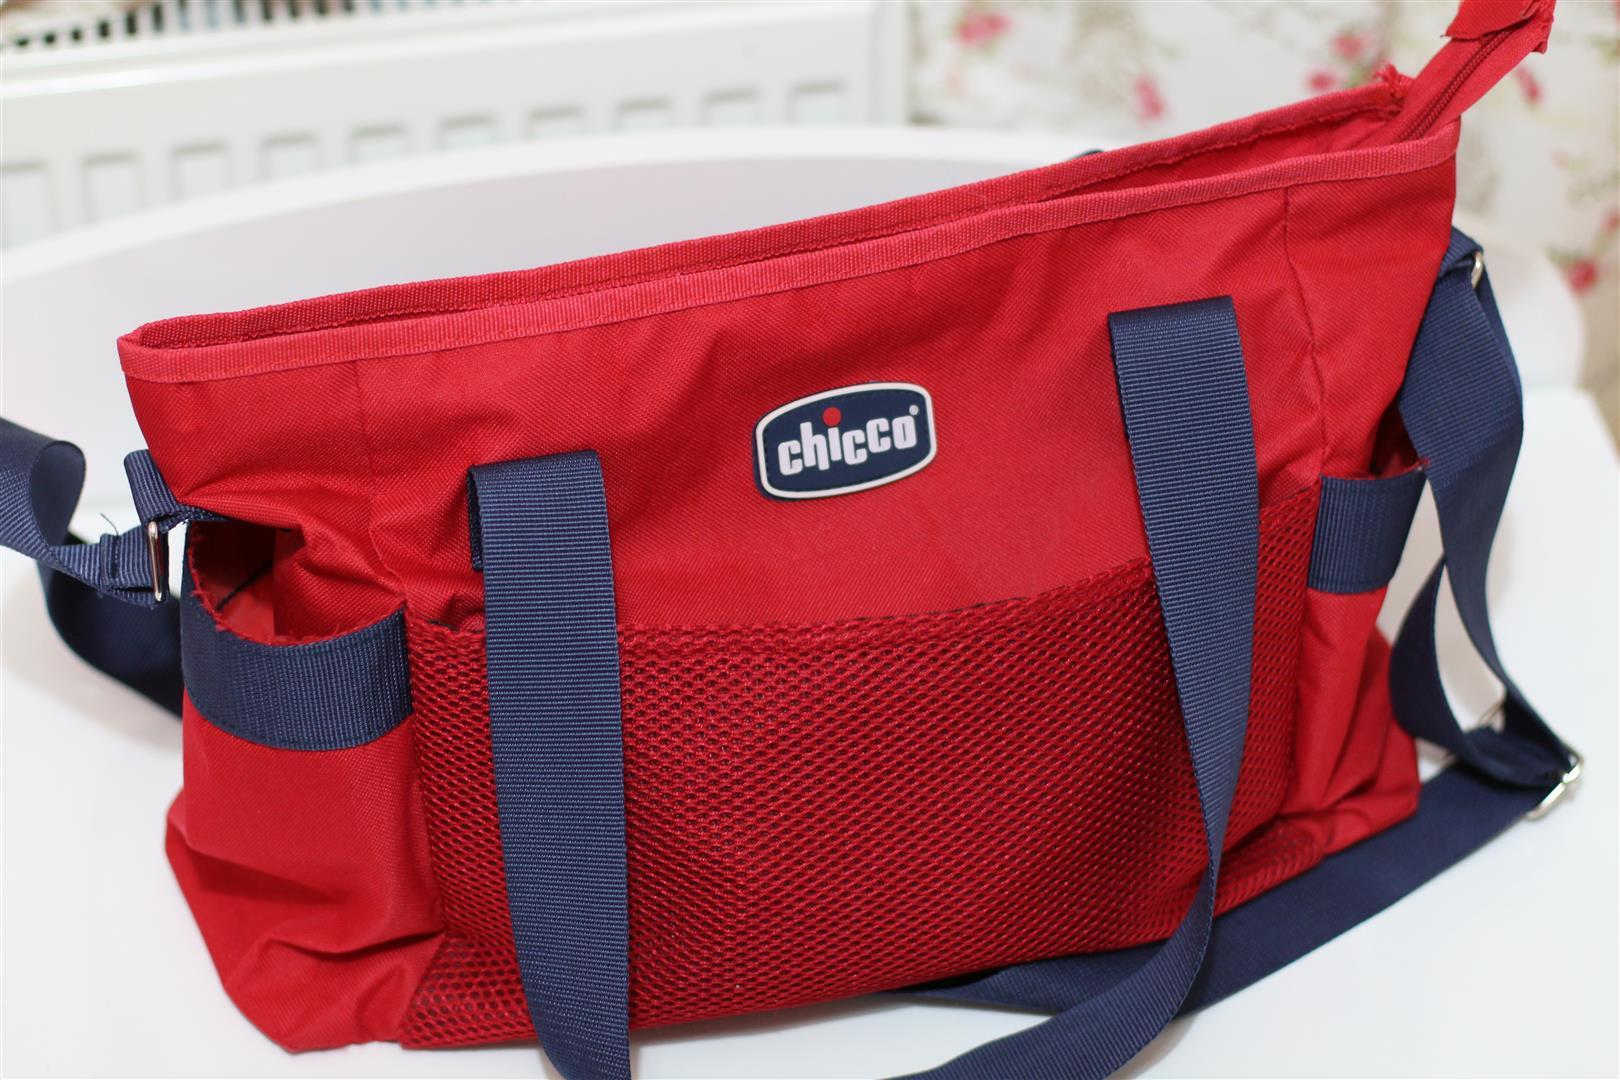 chicco kozmetik çantası